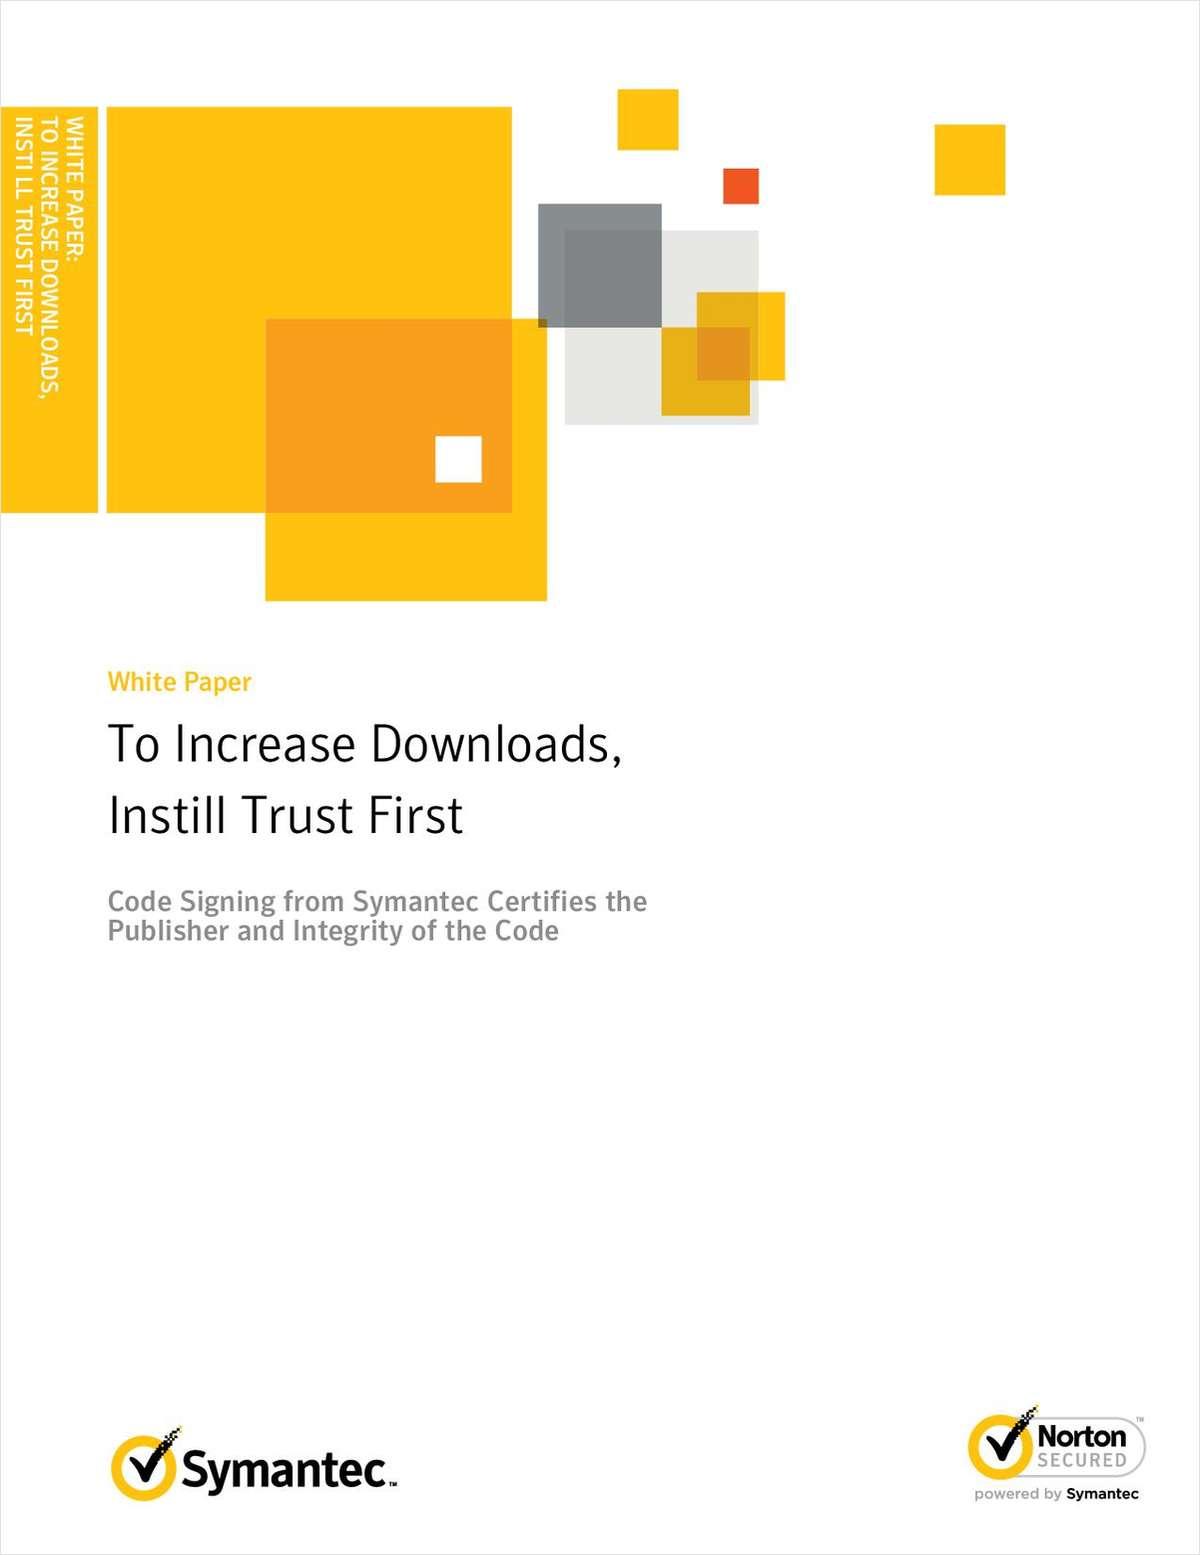 To Increase Downloads Instill Trust First